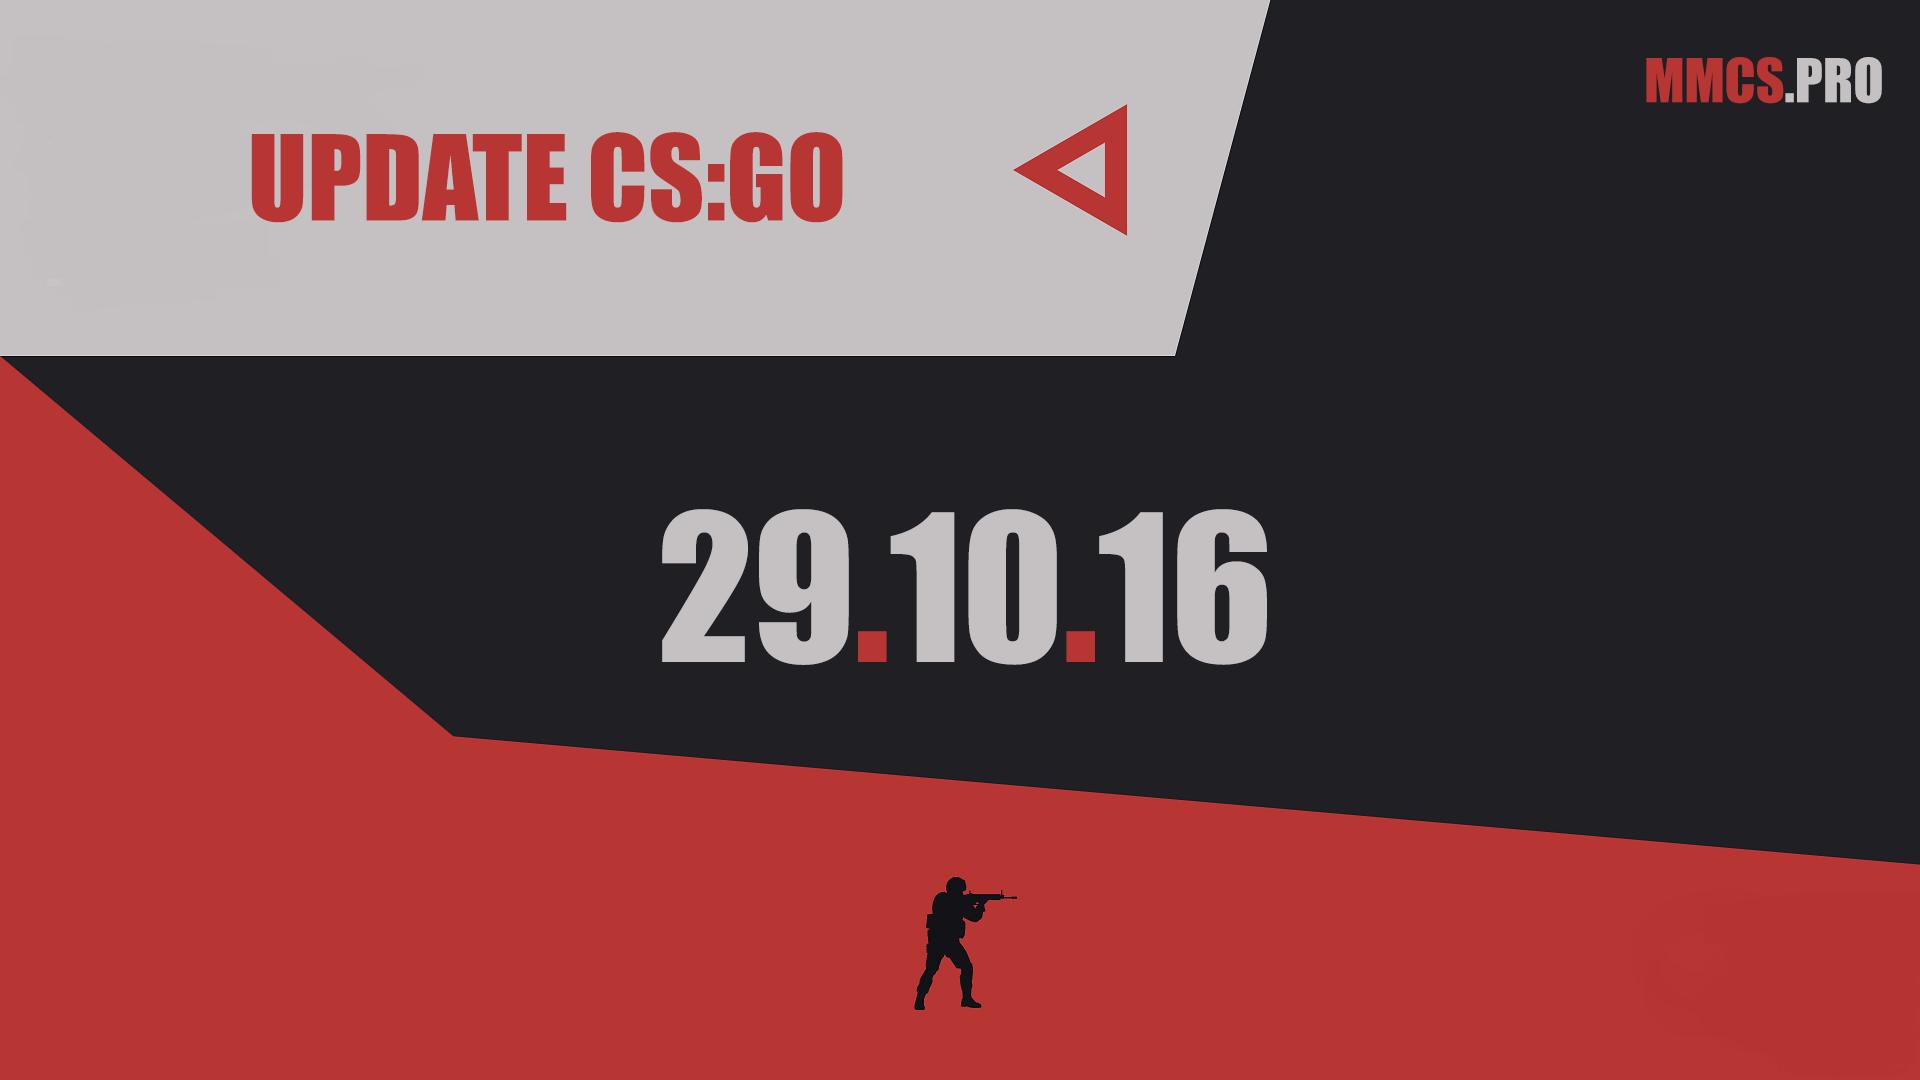 https://mmcs.pro/update-csgo-29-10-2016-valve/